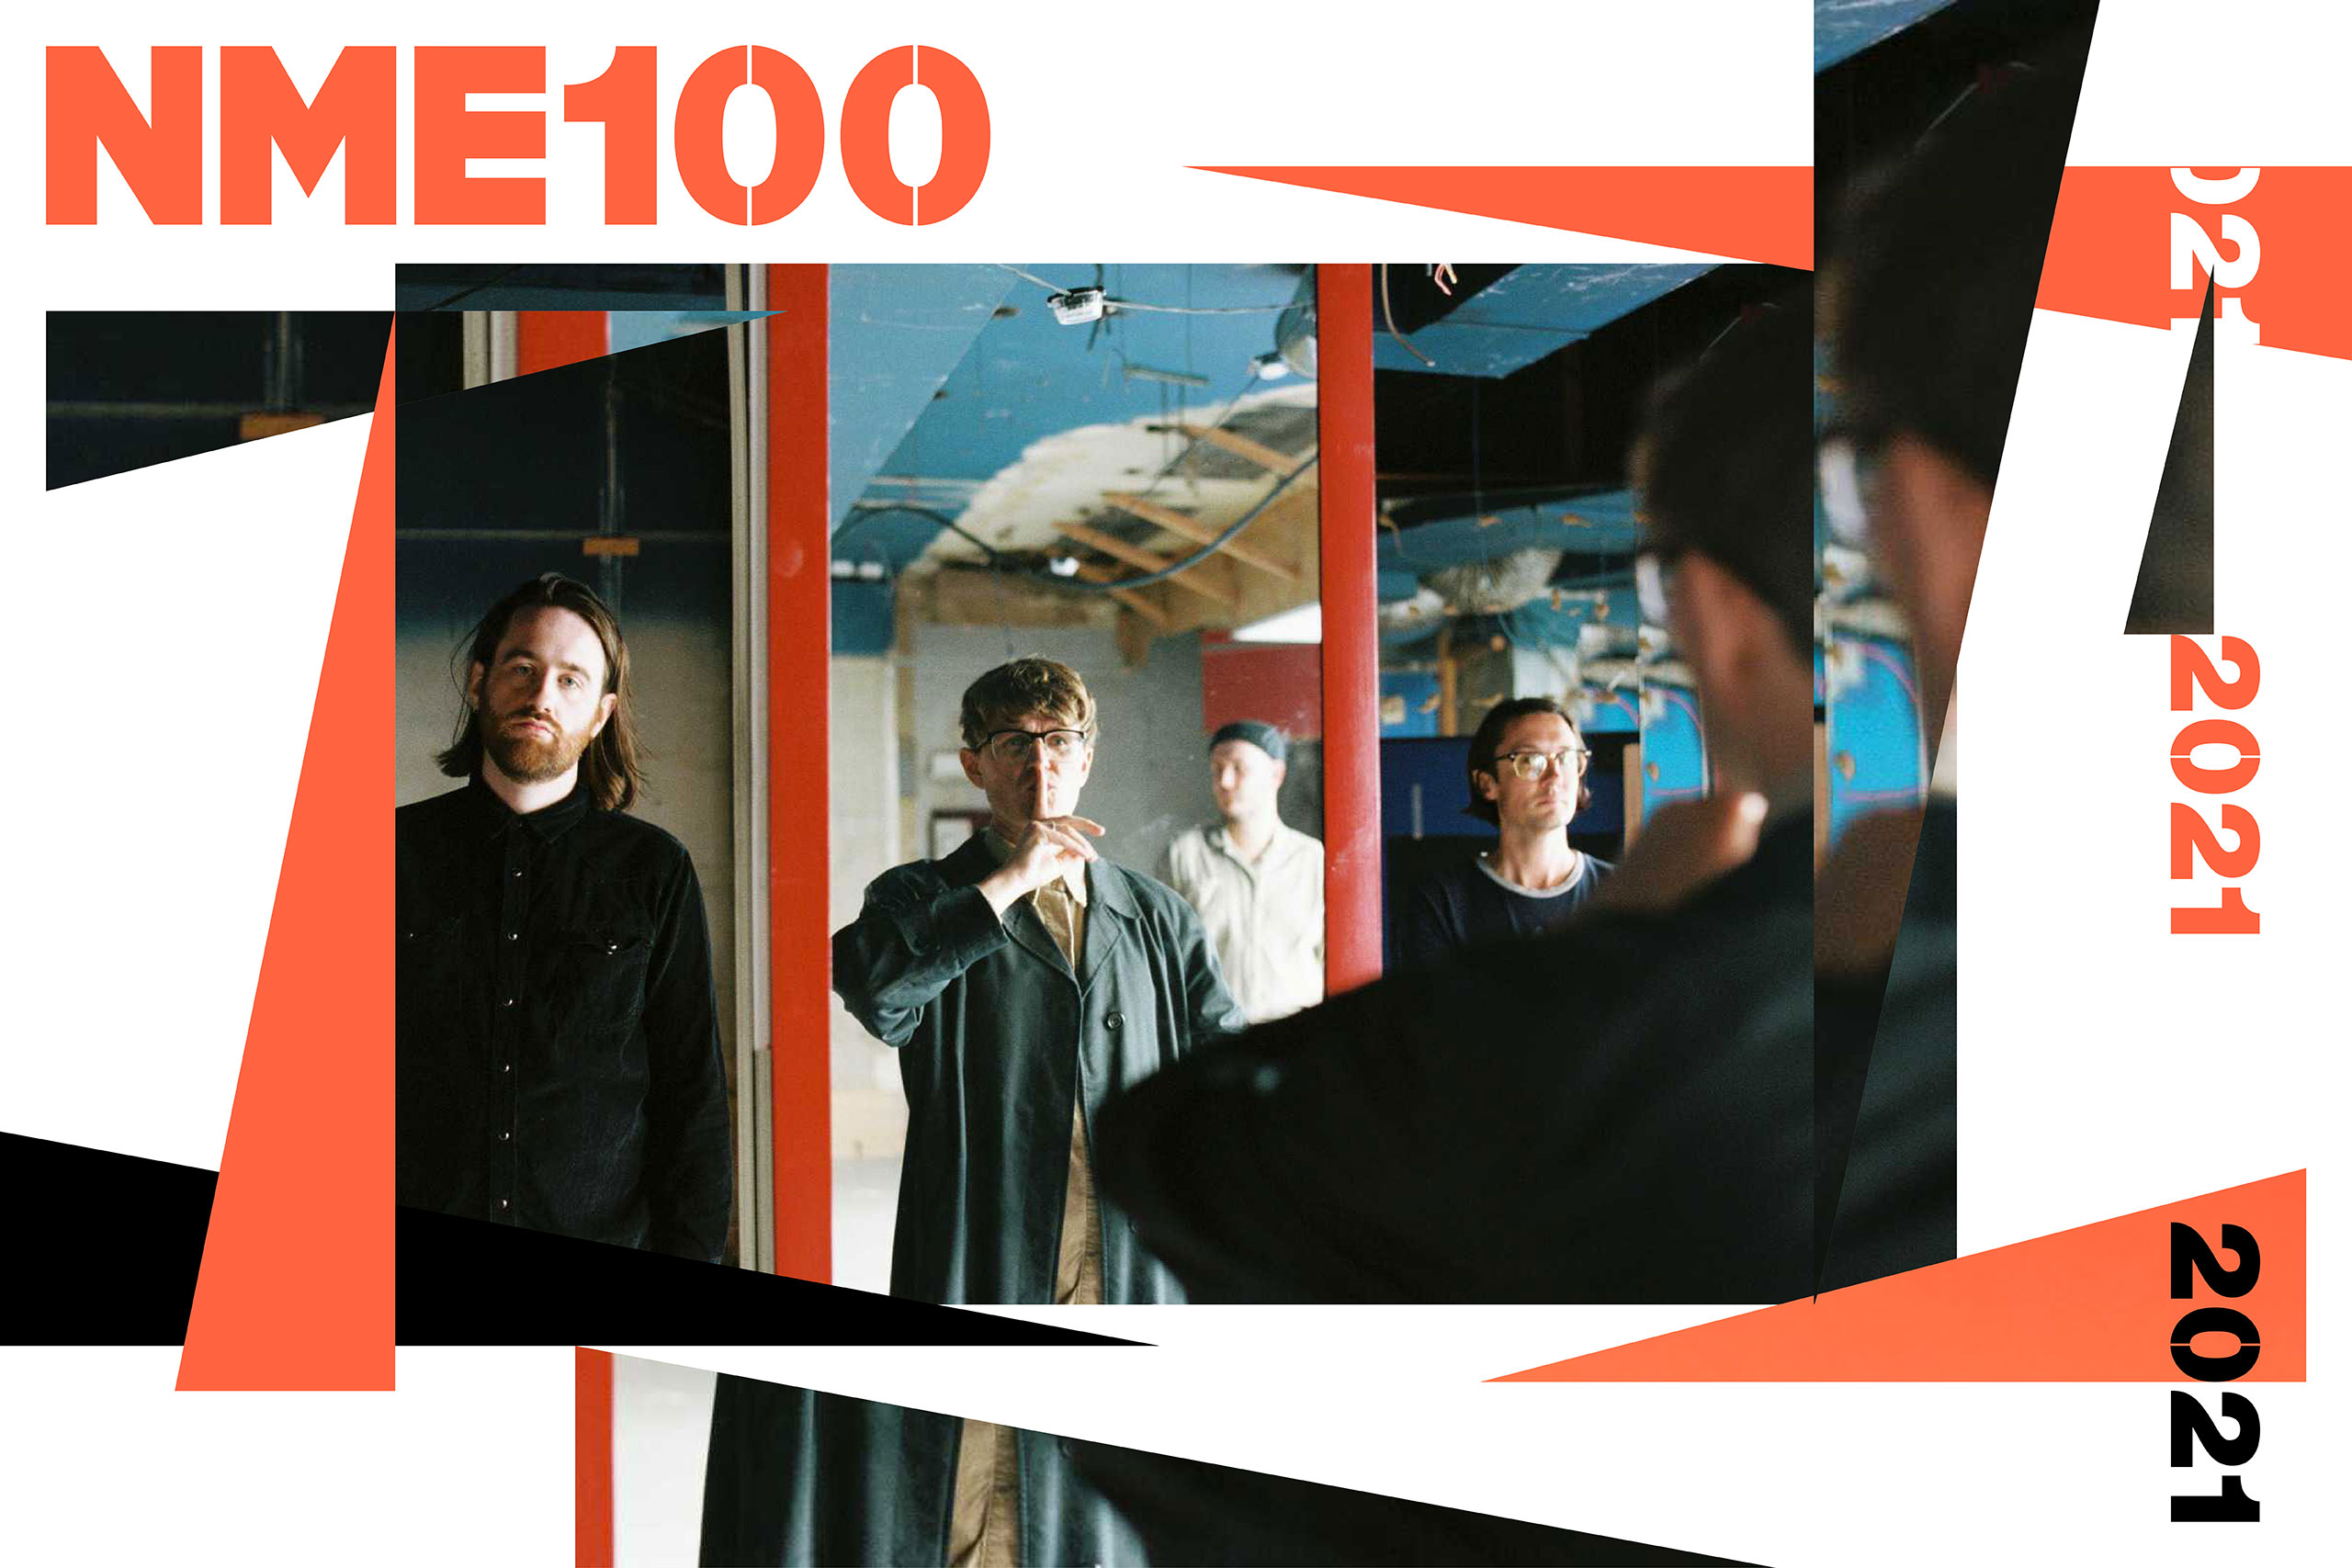 NME 100 yard act